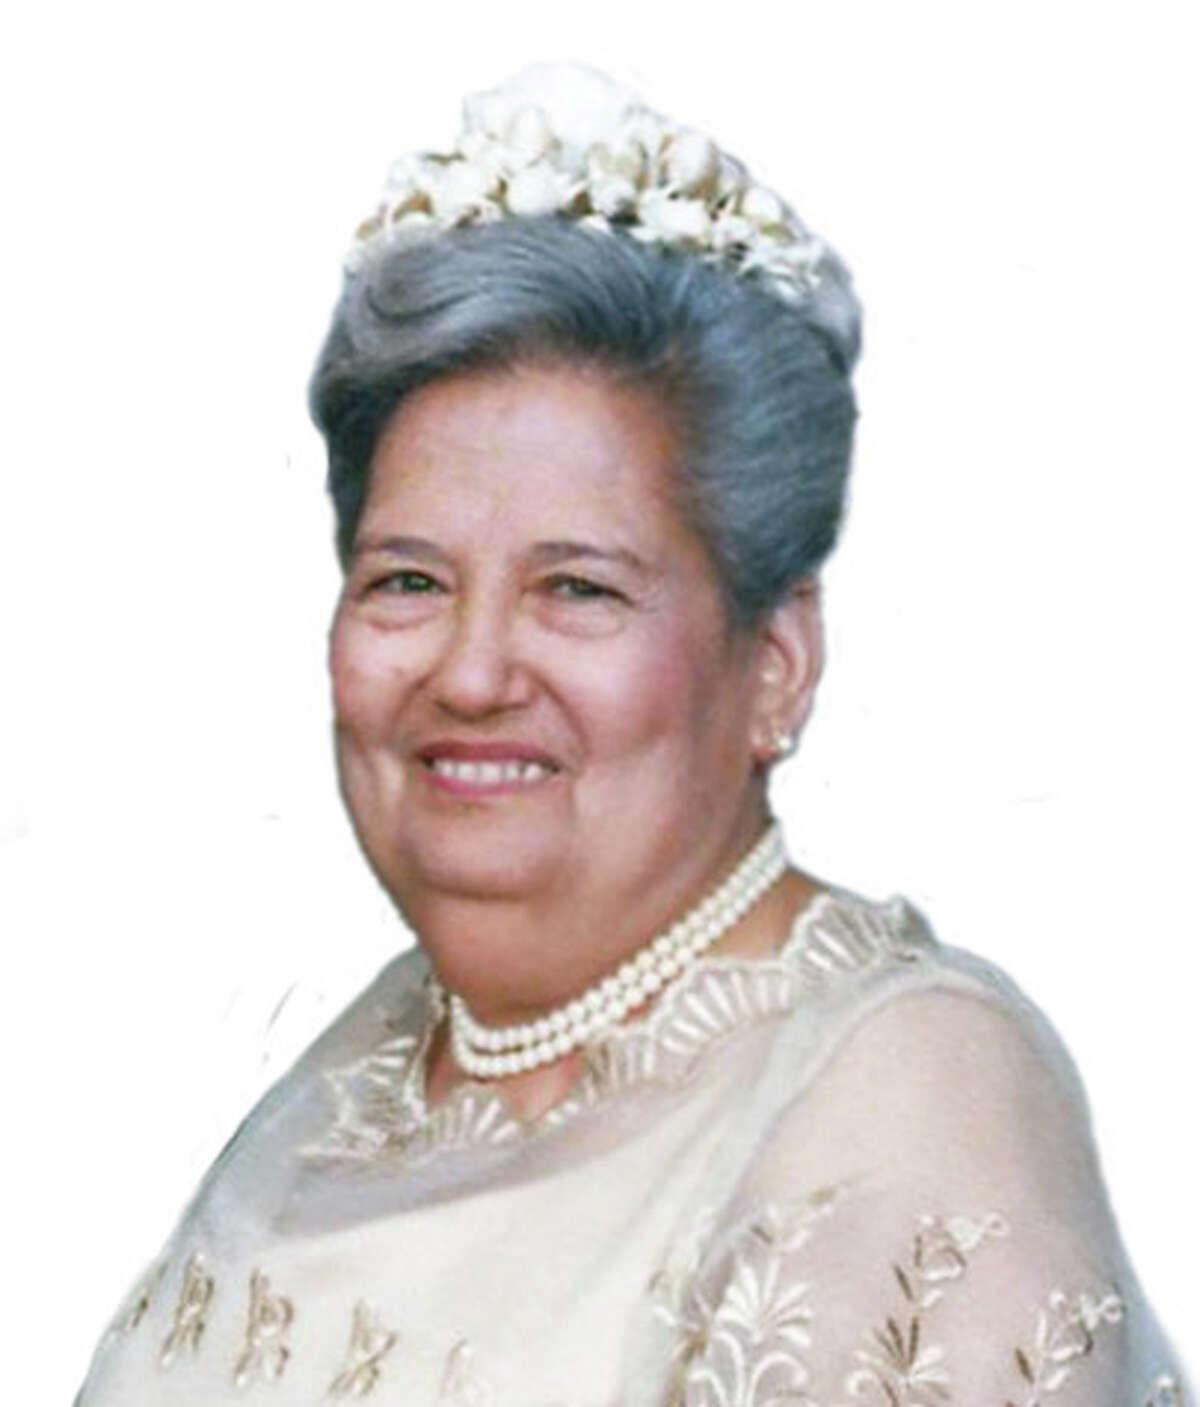 Rafaela Benavides Salinas